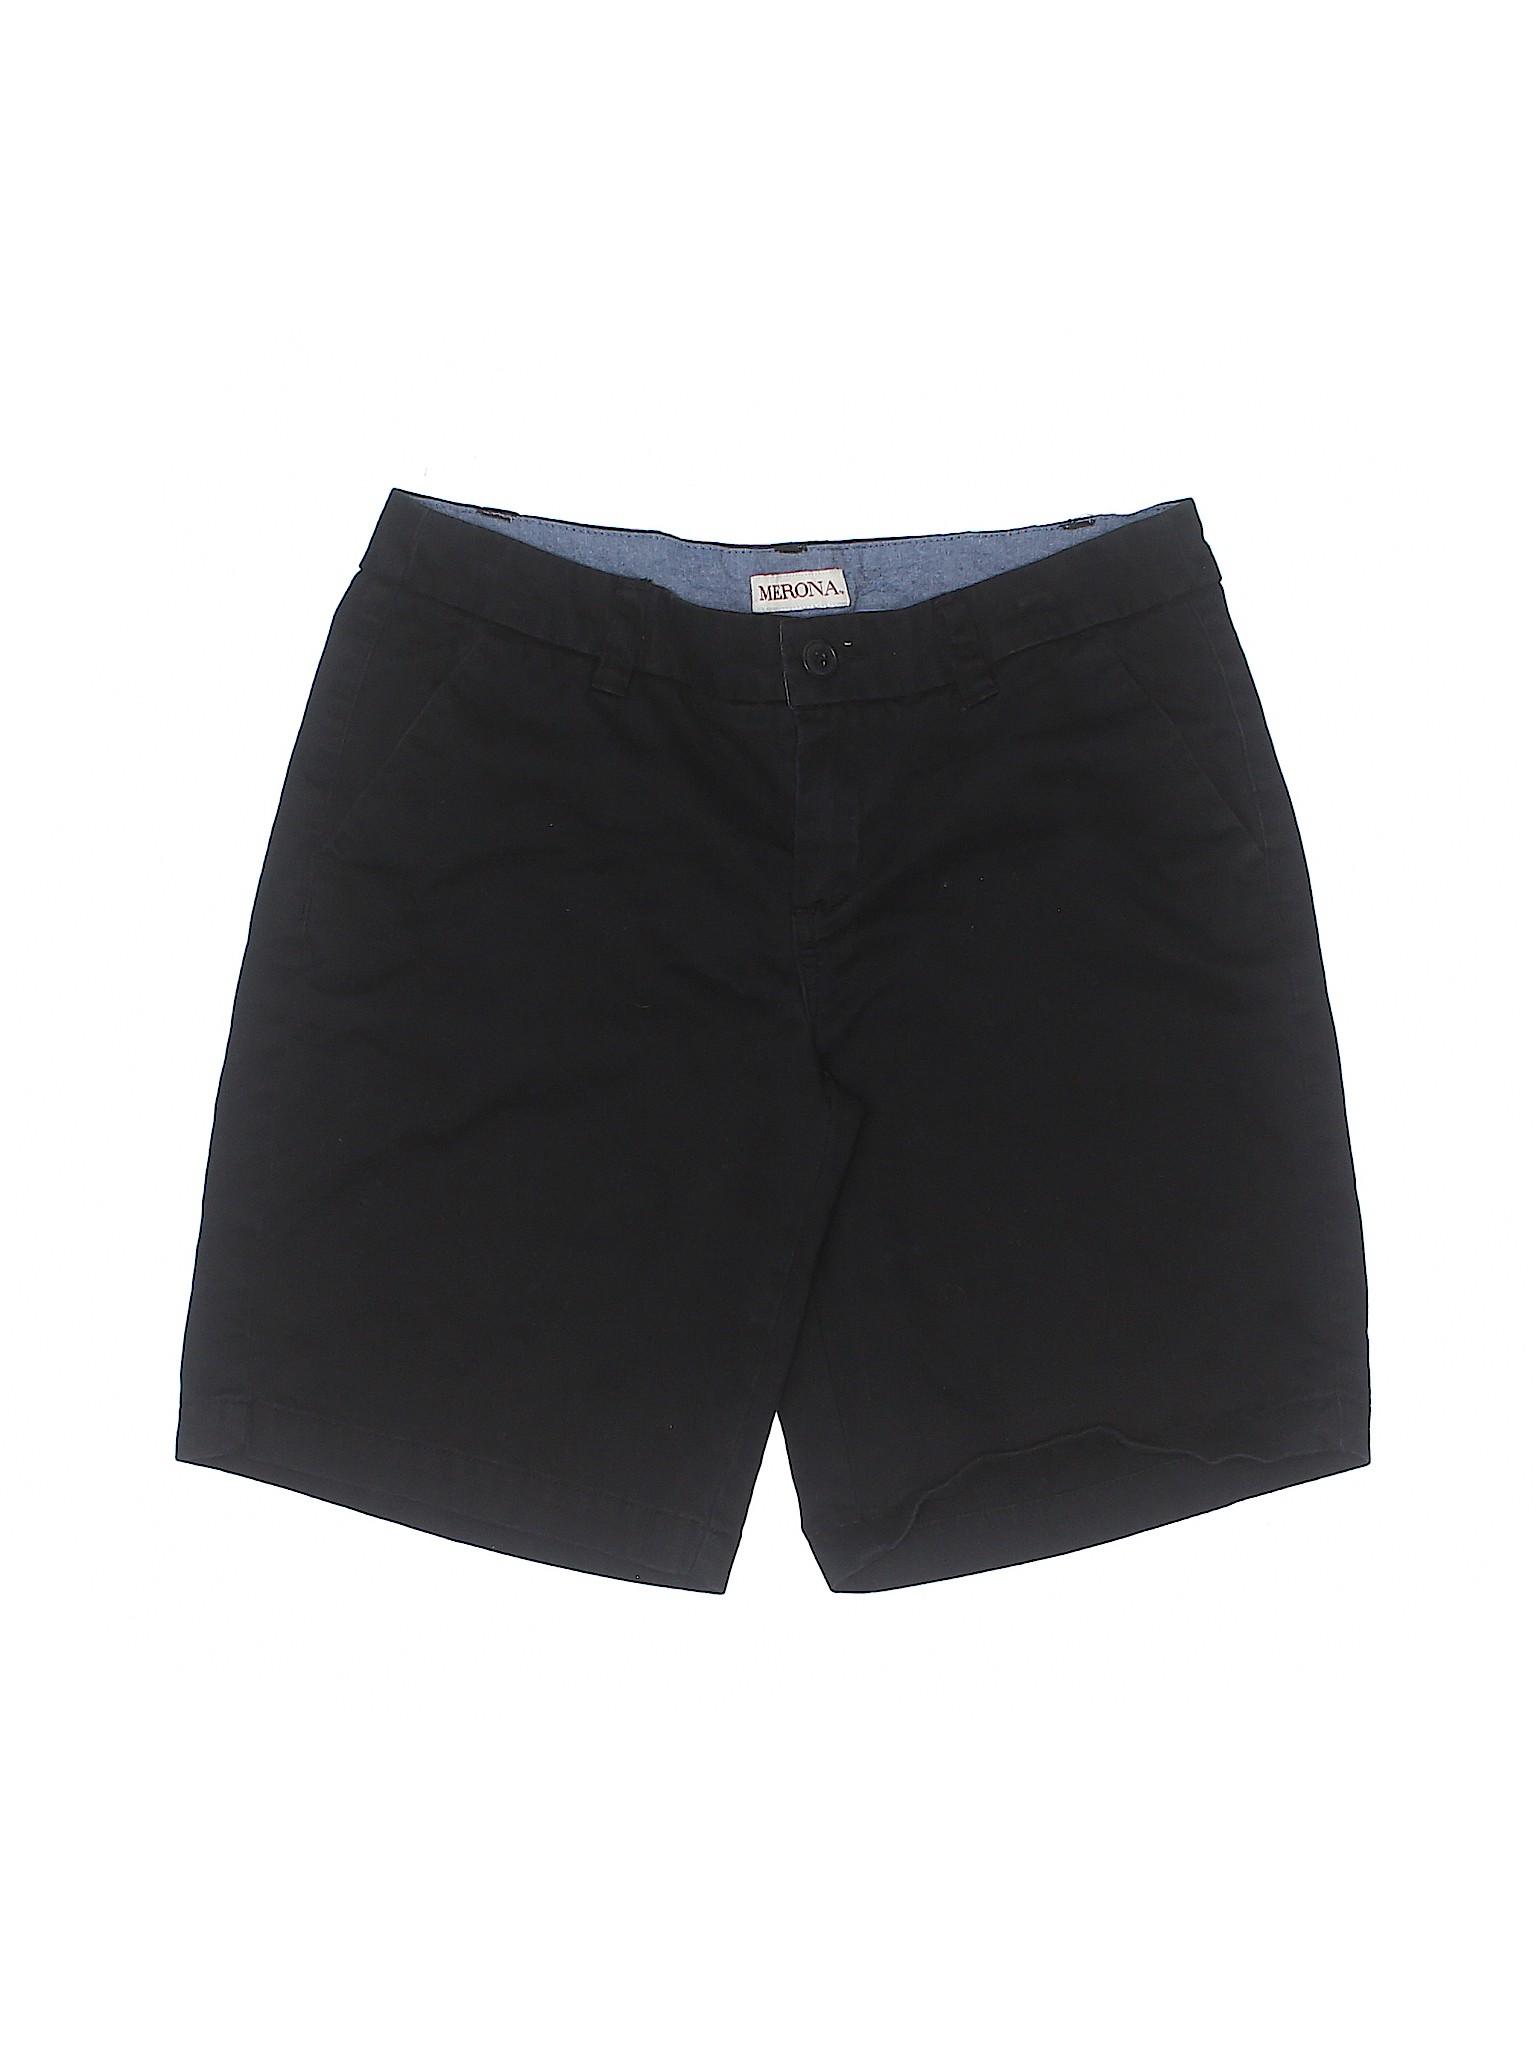 5f5e06cb070 Boutique Merona Boutique Merona Khaki Boutique Shorts Khaki Merona Shorts  Khaki Shorts CASYwxqY ...